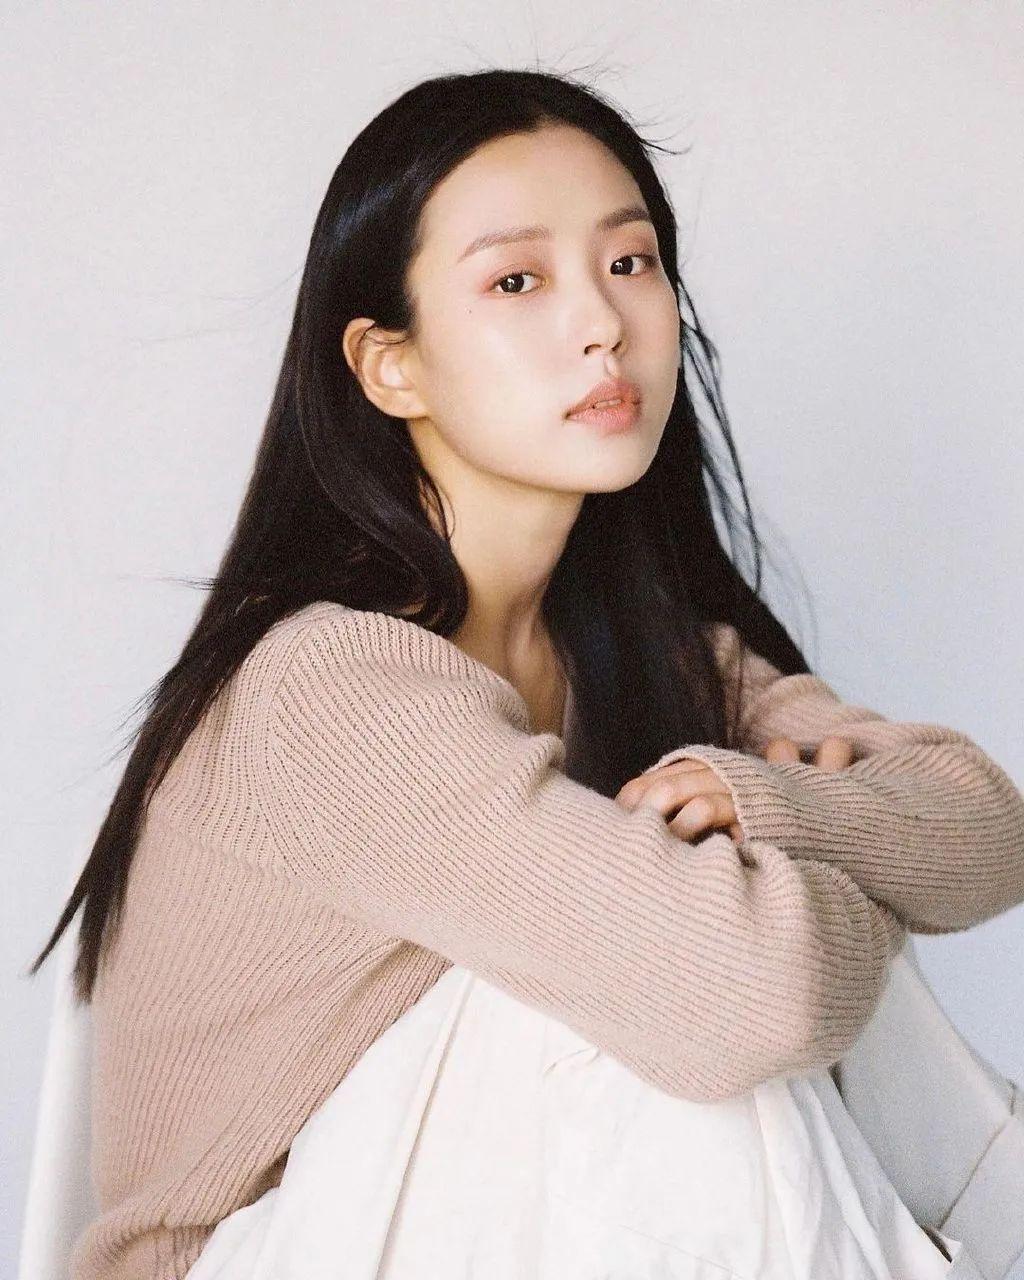 Face bump Kim min hee Korean drama atmosphere beauty + 1插图33